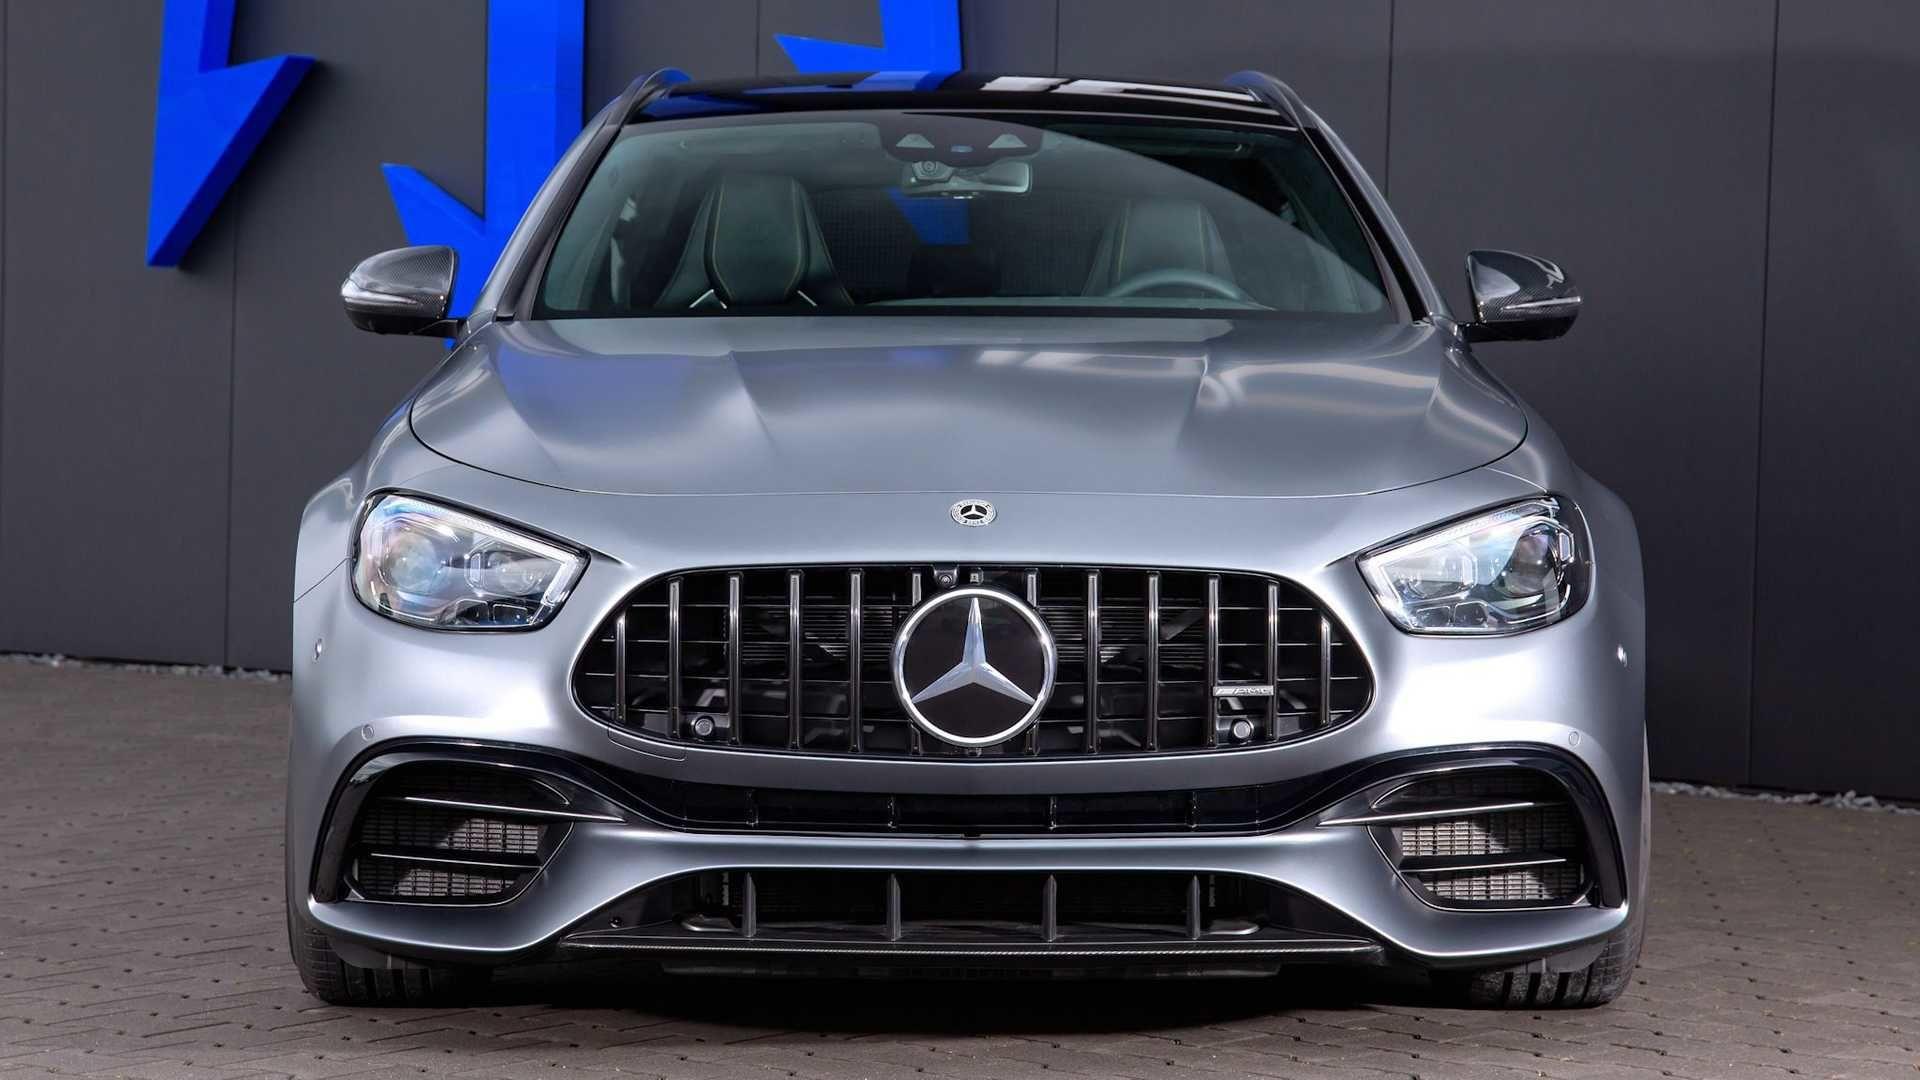 Posaidon 推出 Mercedes-AMG E63 S Wagon 的完善動力大補丸套件